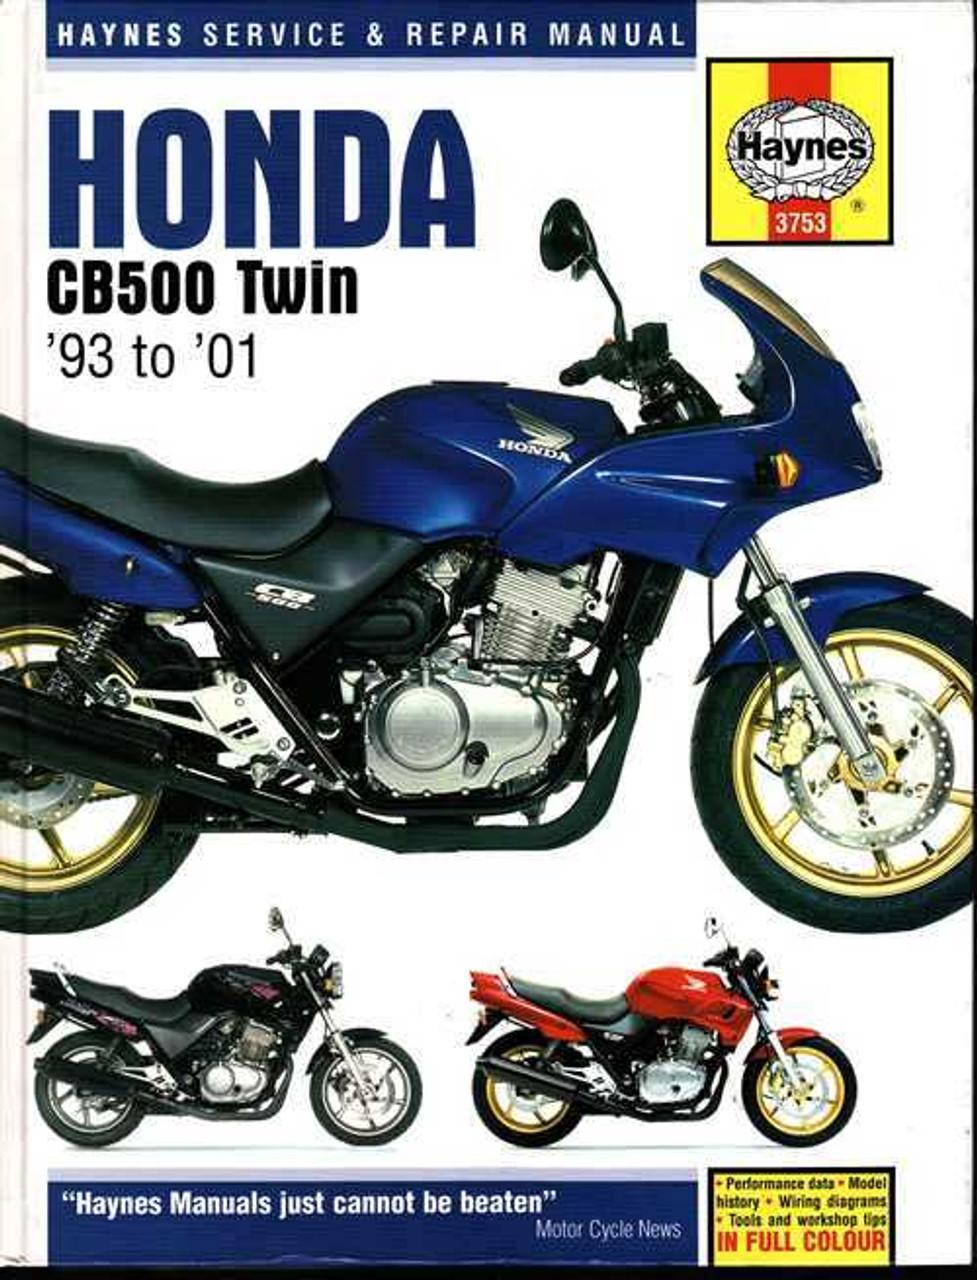 Honda CB500 Twin 1993 - 2001 Workshop Manual